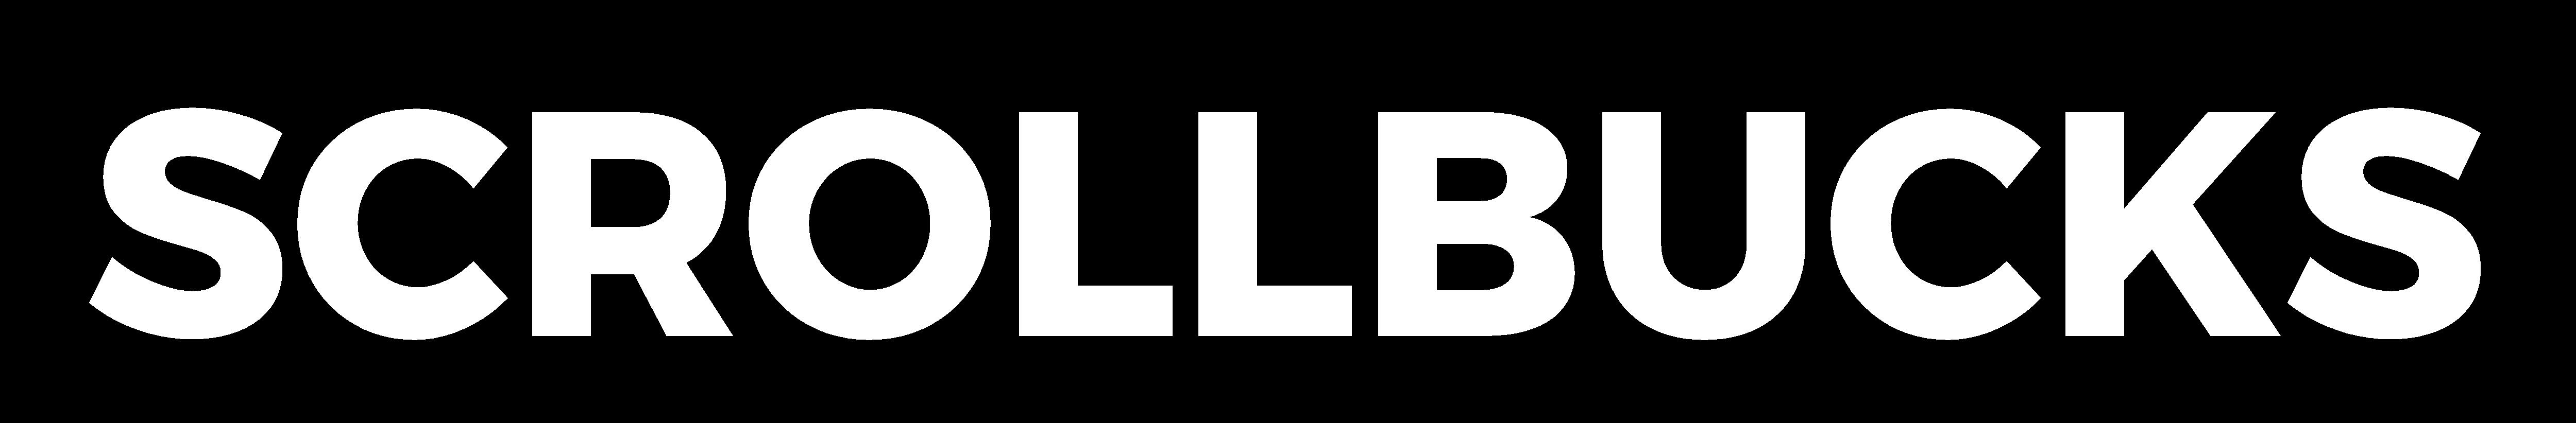 ScrollBucks